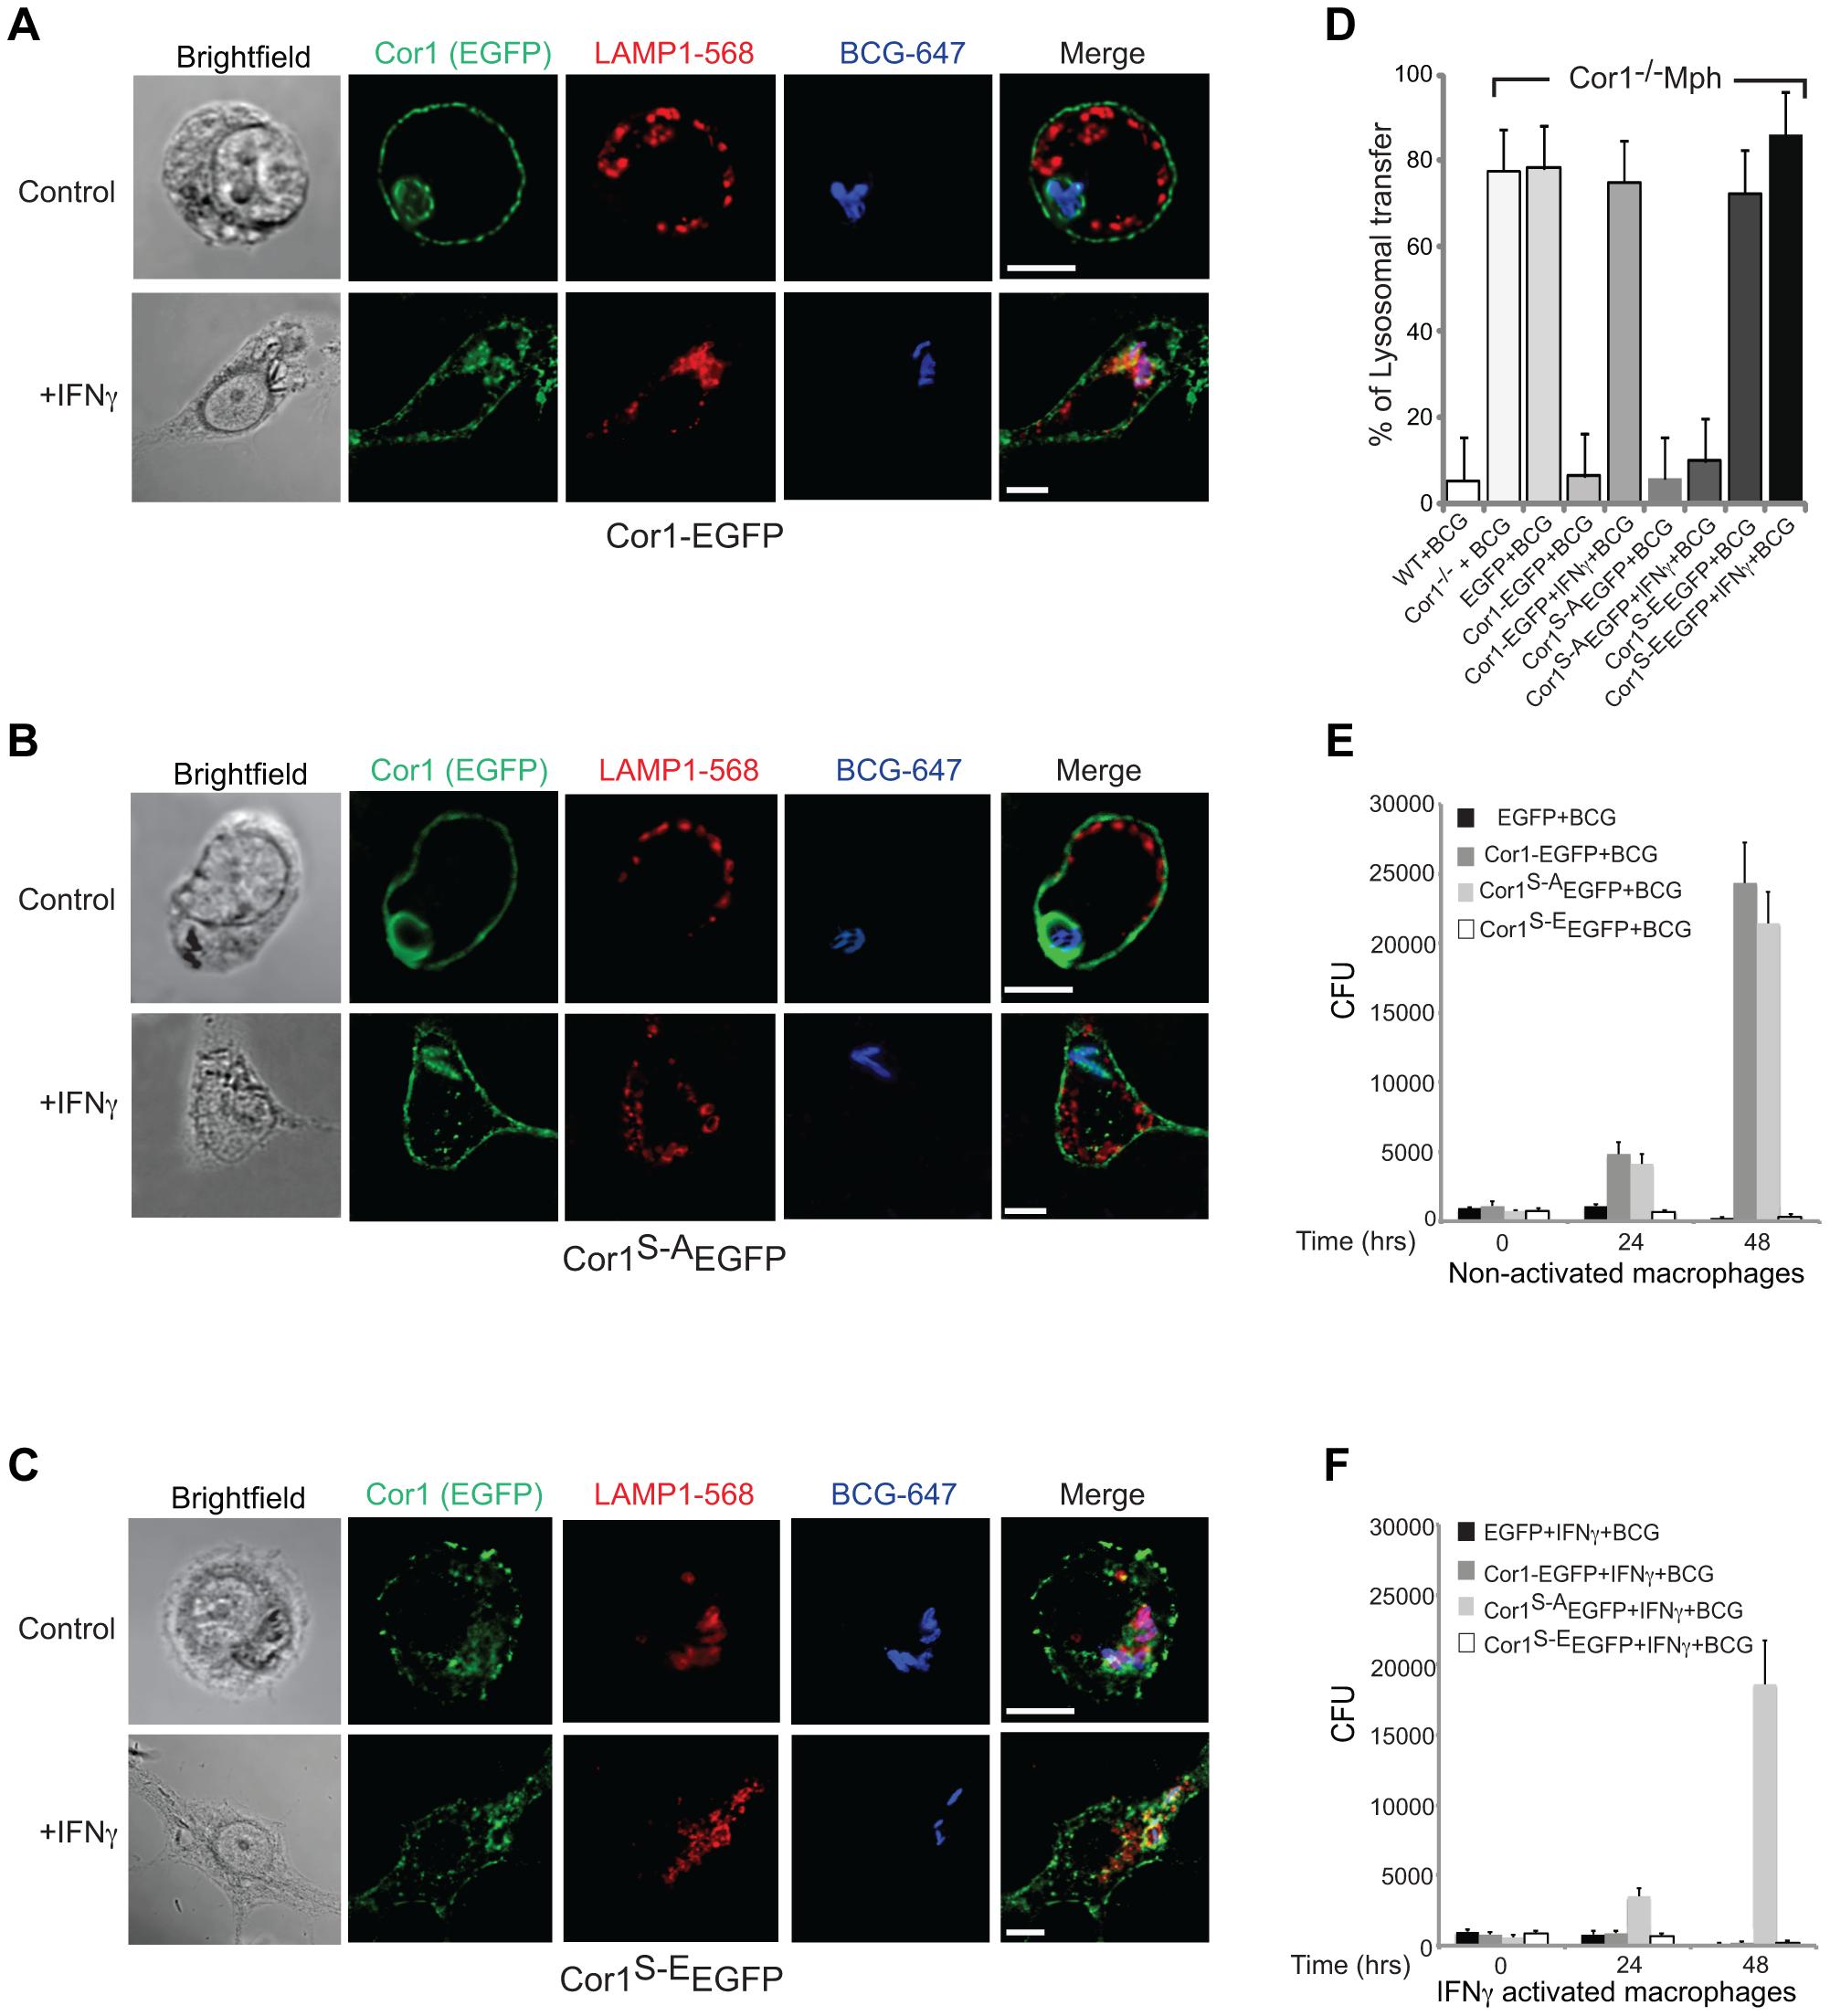 Importance of serine phosphorylated coronin 1 for mycobacterial killing and cargo delivery via macropinocytosis.